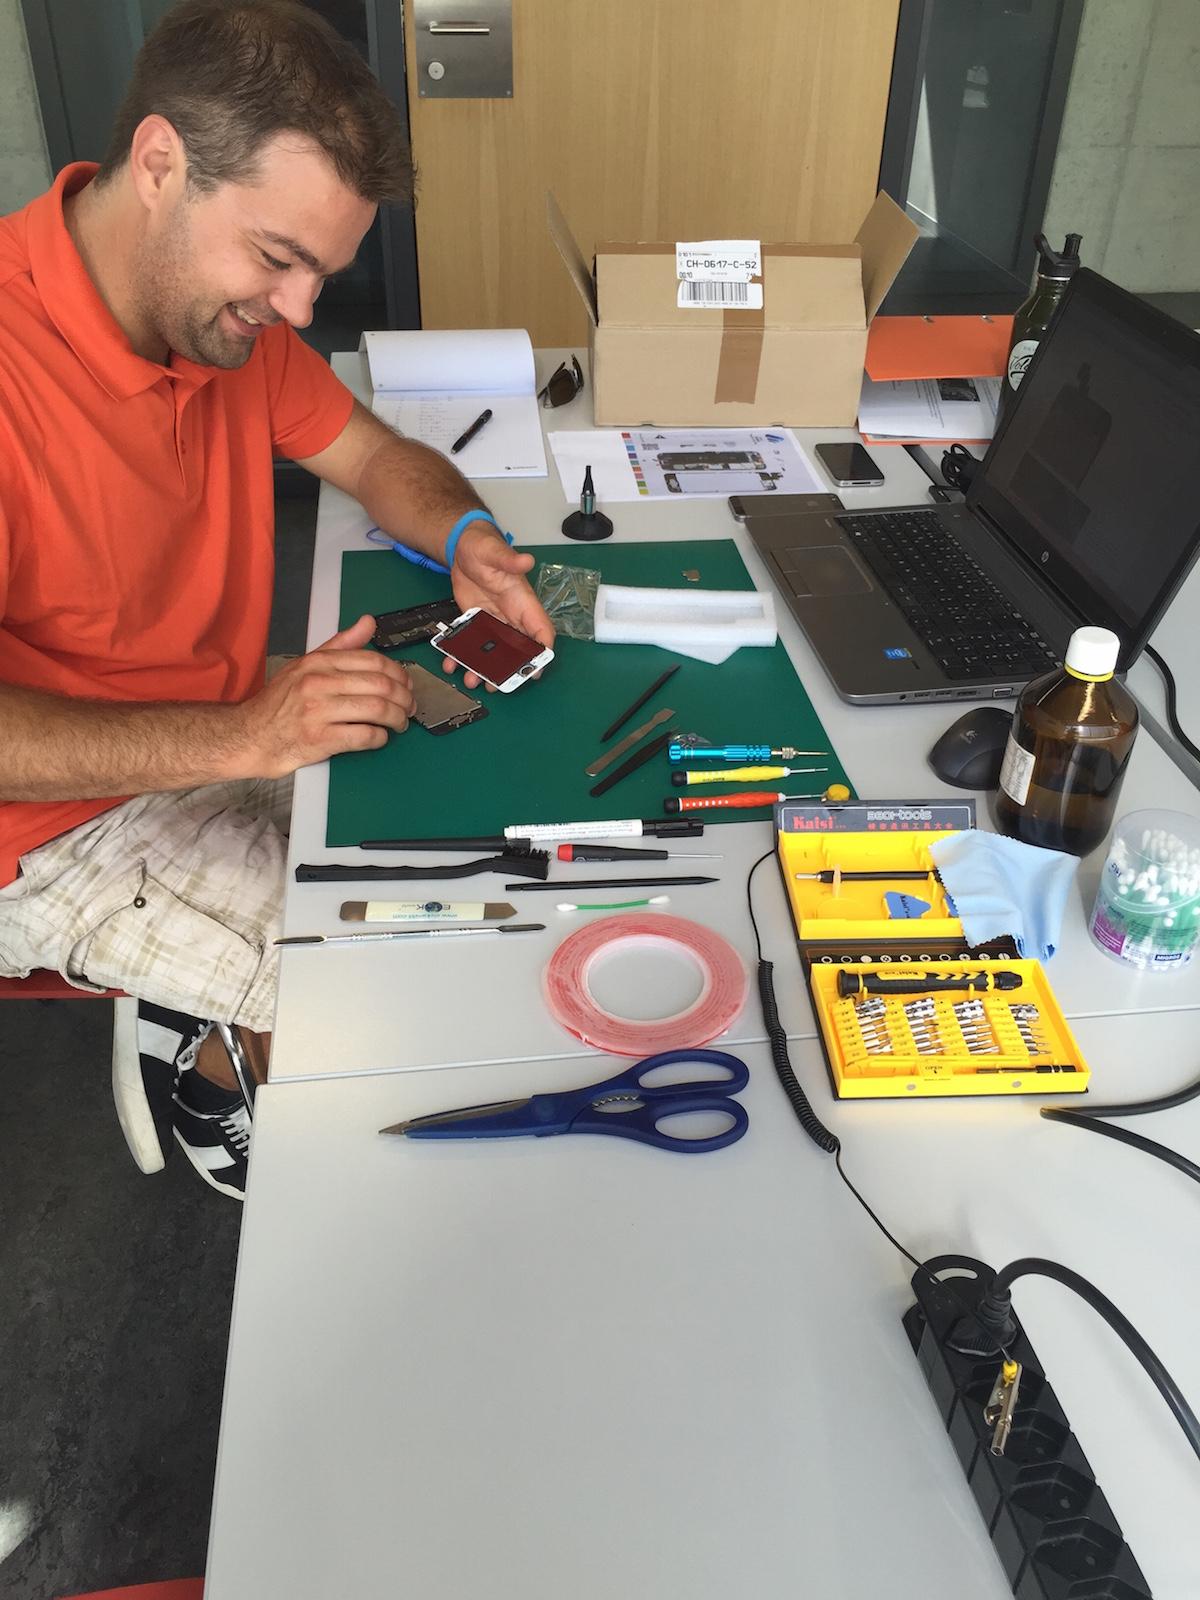 MobileRevolution-Linth Michi-Schnyder iPhone-Reparatur Tuggen iPhone-Reparatur Gossau small